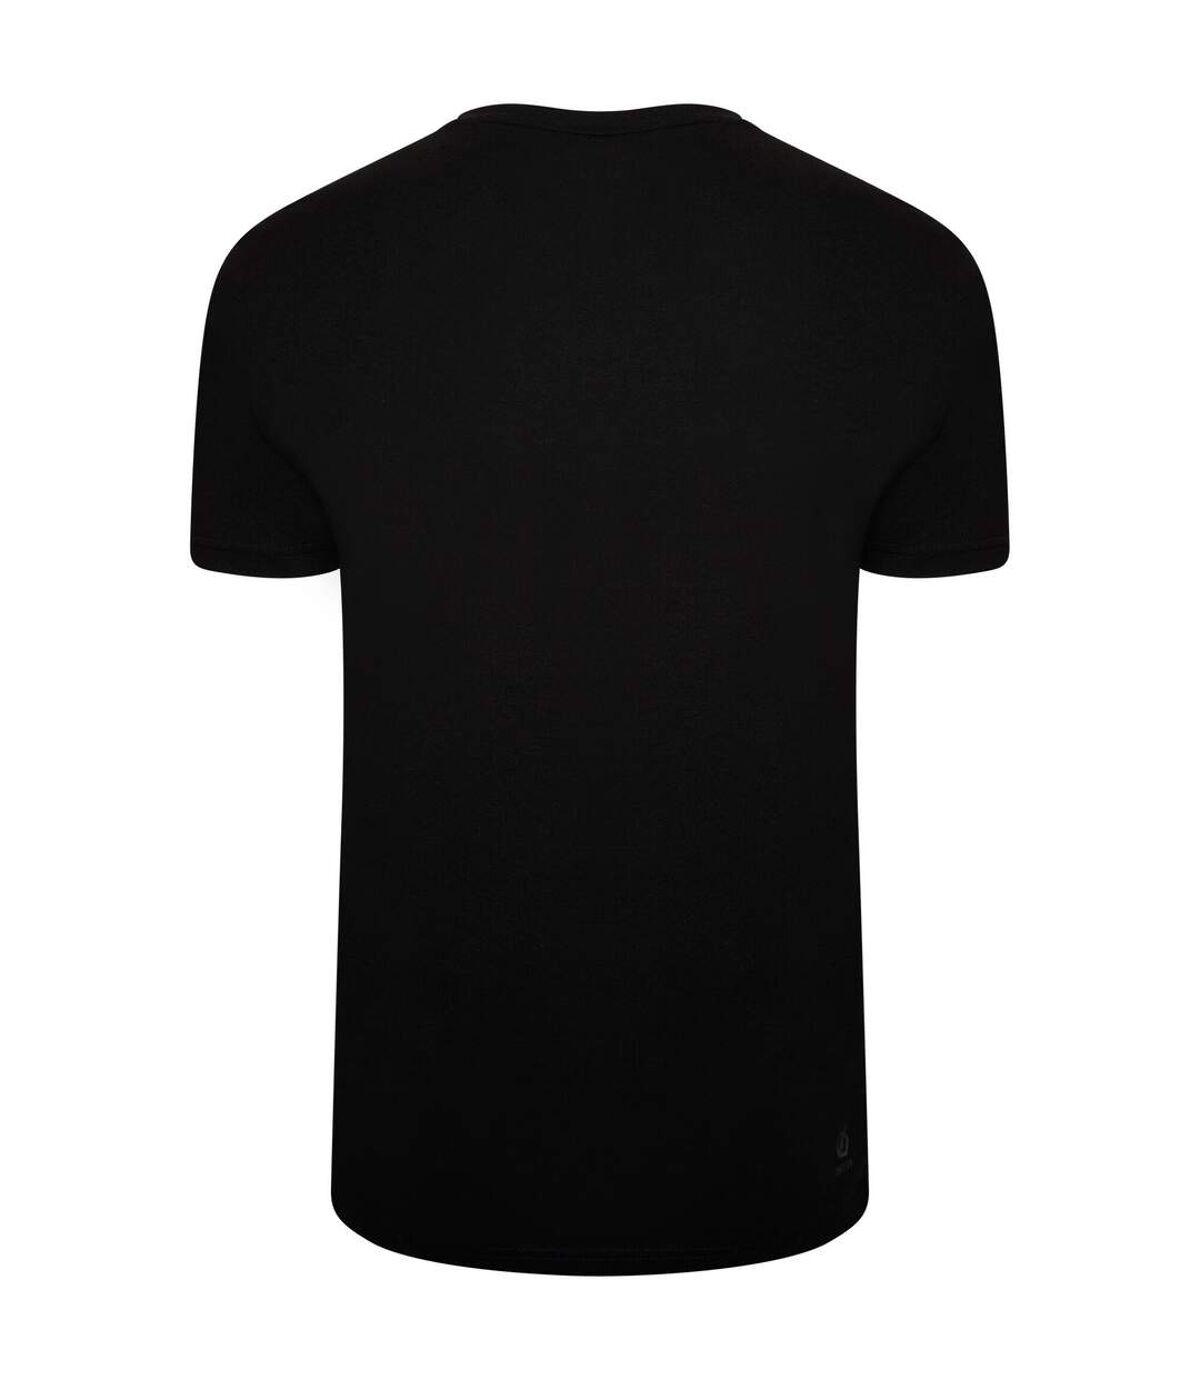 Dare 2B - T-shirt INTEGRAL - Homme (Noir / ébène) - UTRG5803